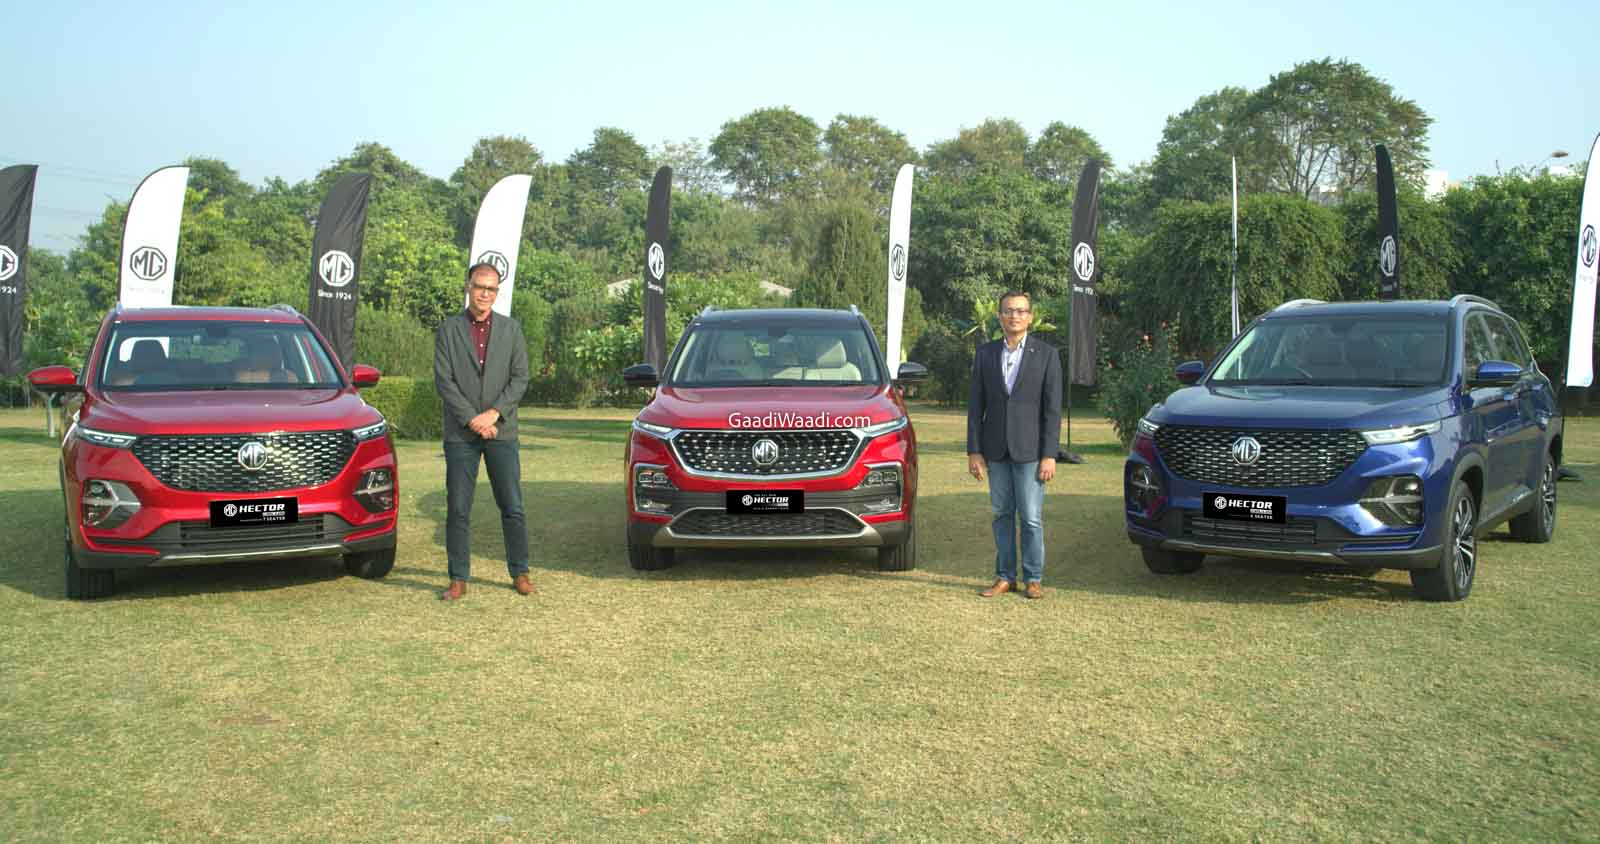 MG Hector & Hector Plus Receive Yet Another Price Hike – Details - GaadiWaadi.com